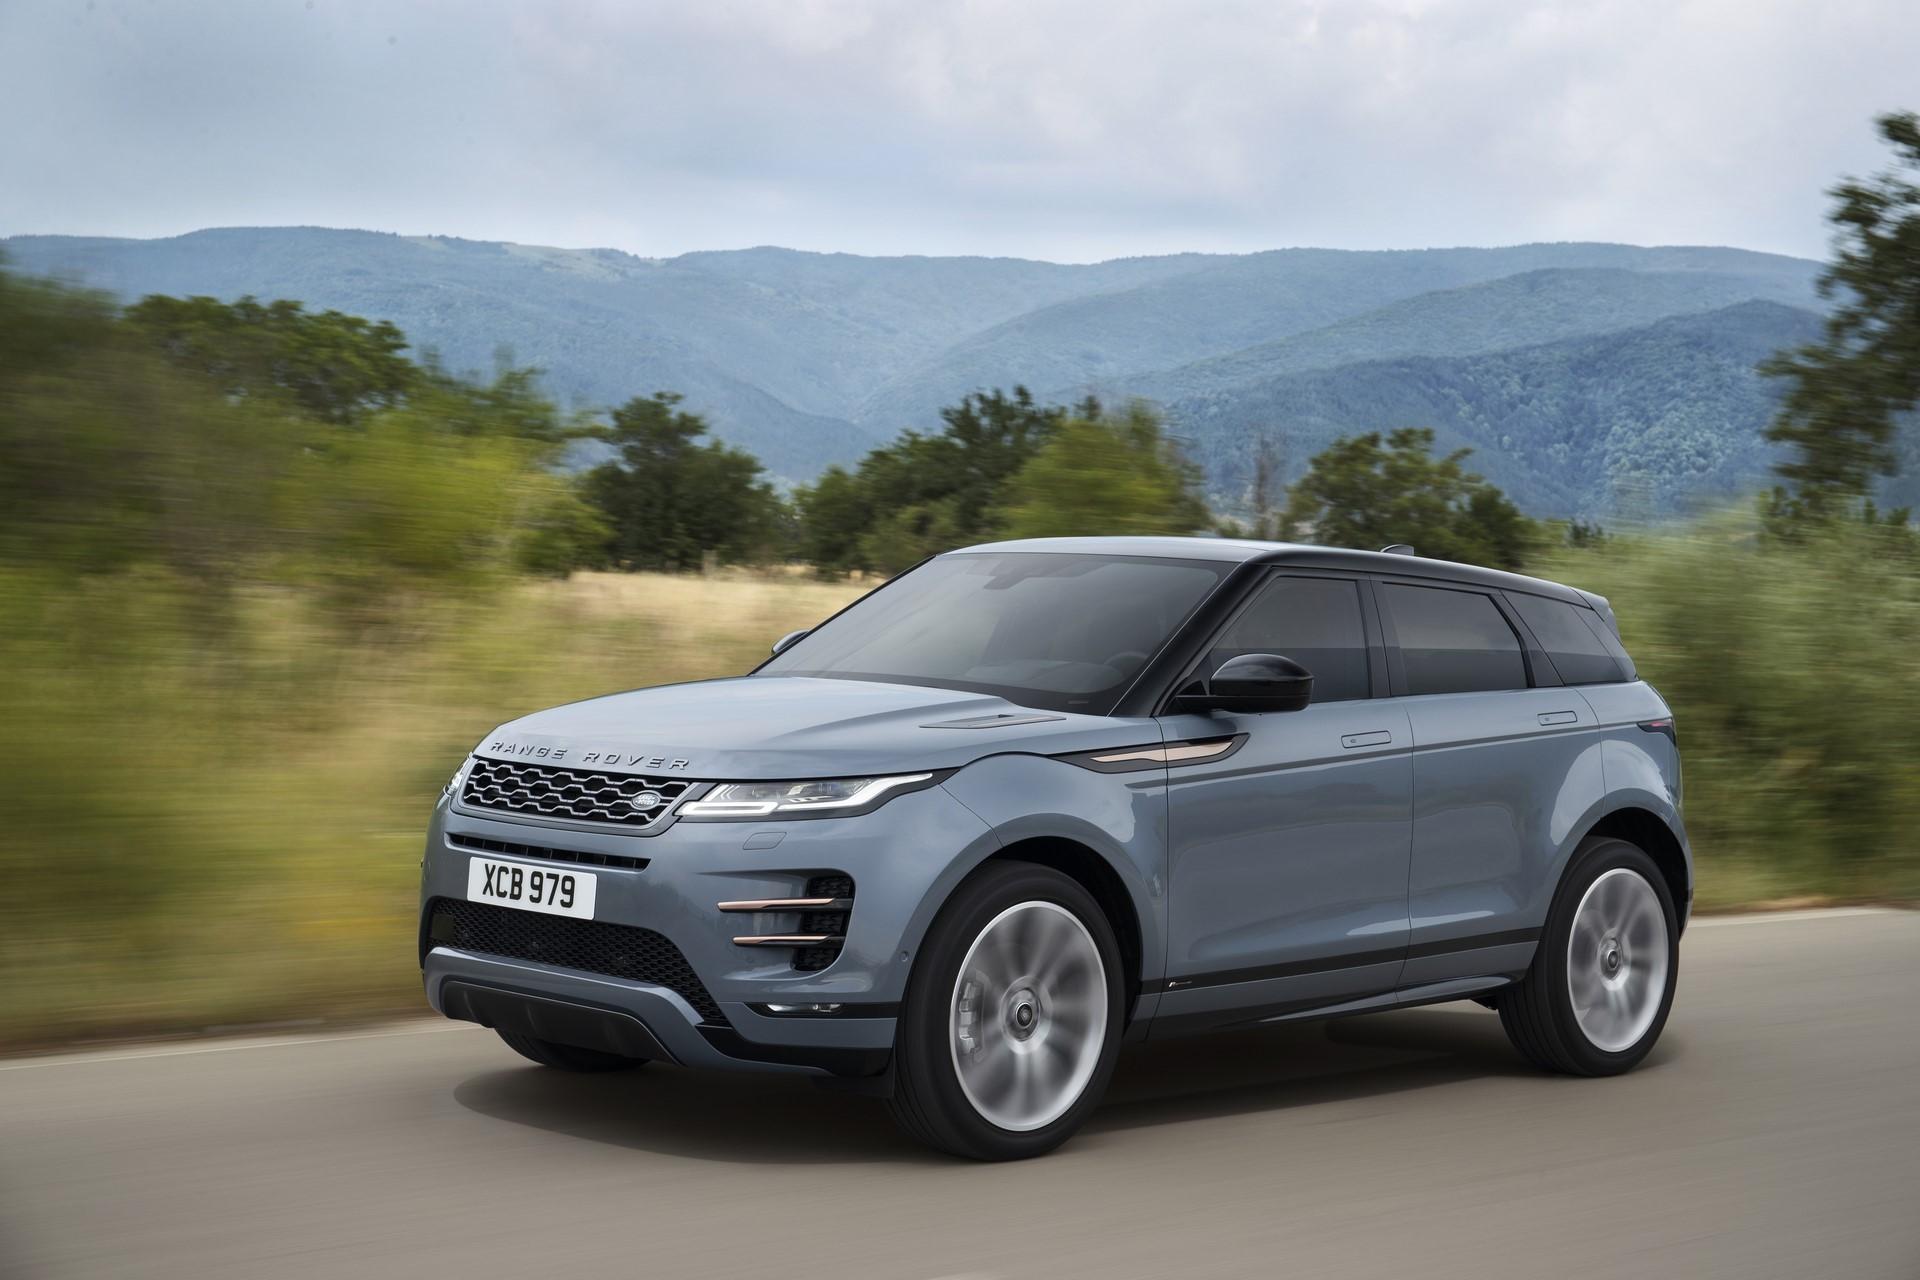 Range Rover Evoque 2019 (38)